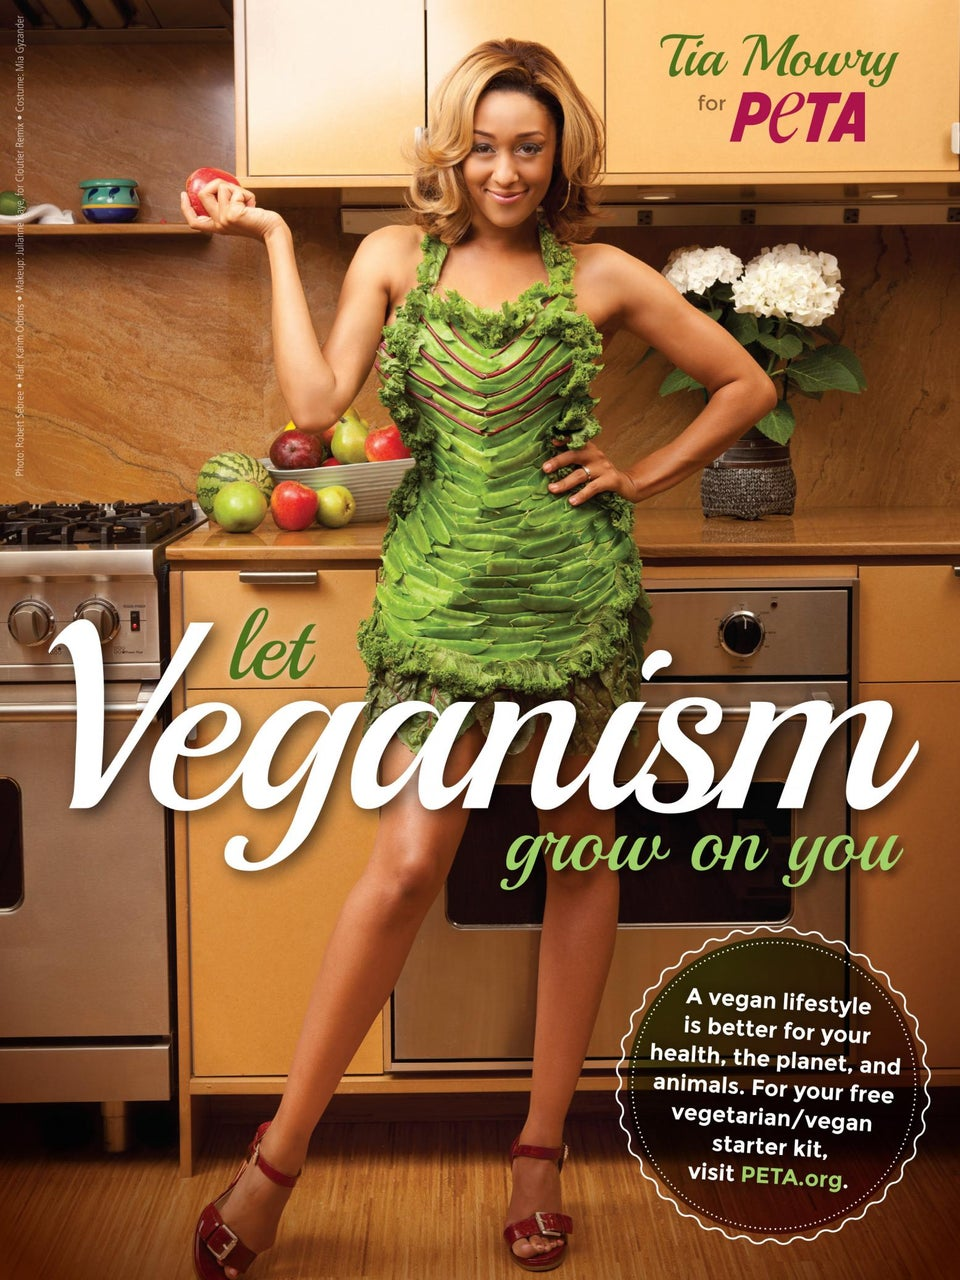 Tia Mowry Poses for PETA, Promotes Veganism